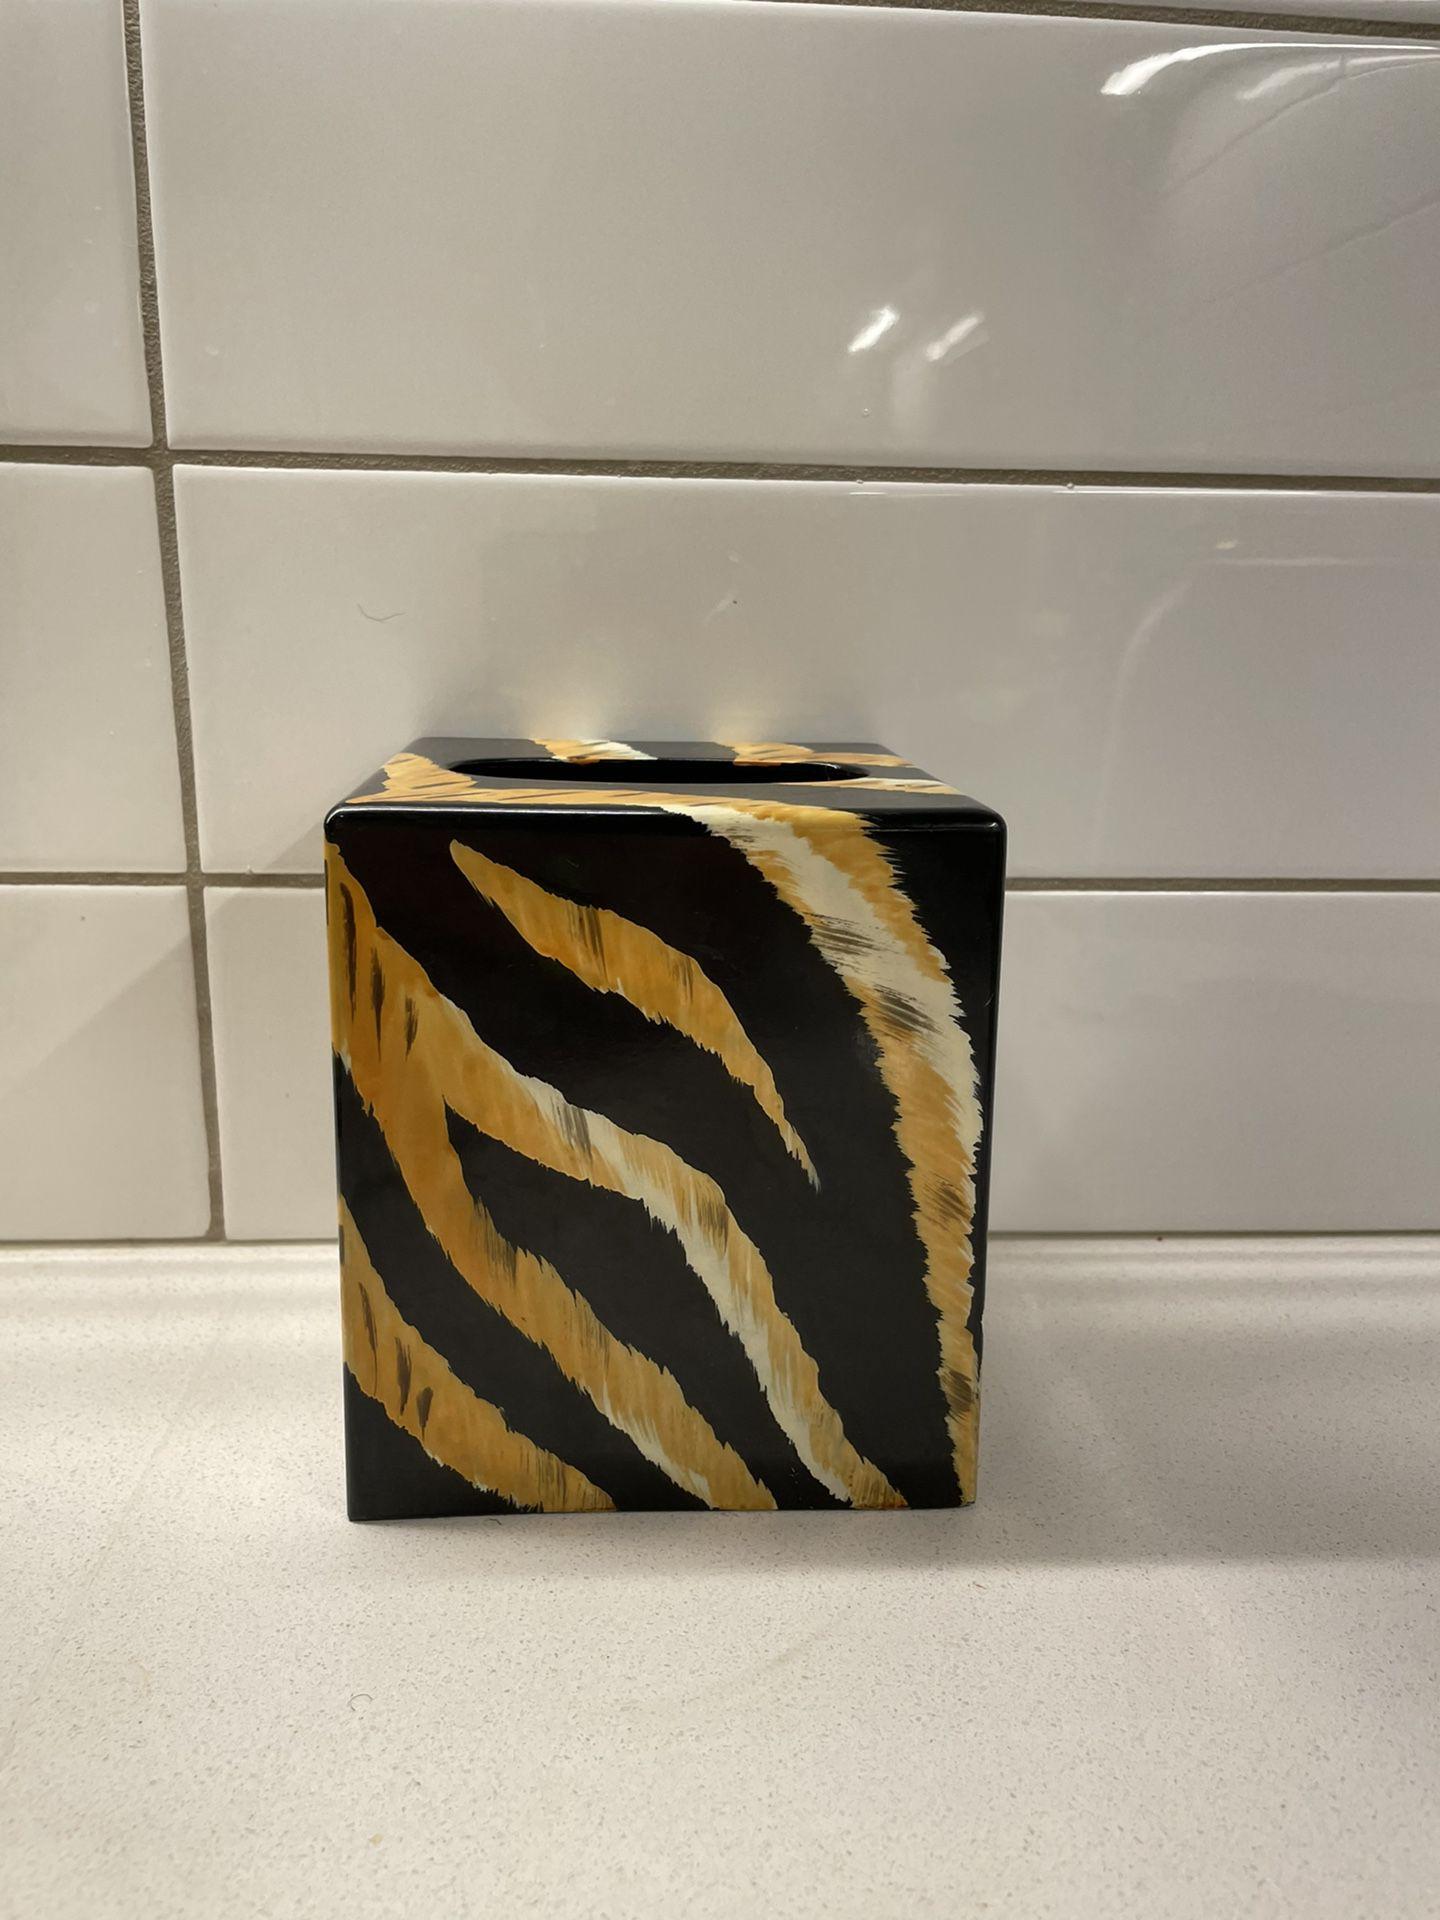 Tiger Print Tissue Box/Decor/Vase